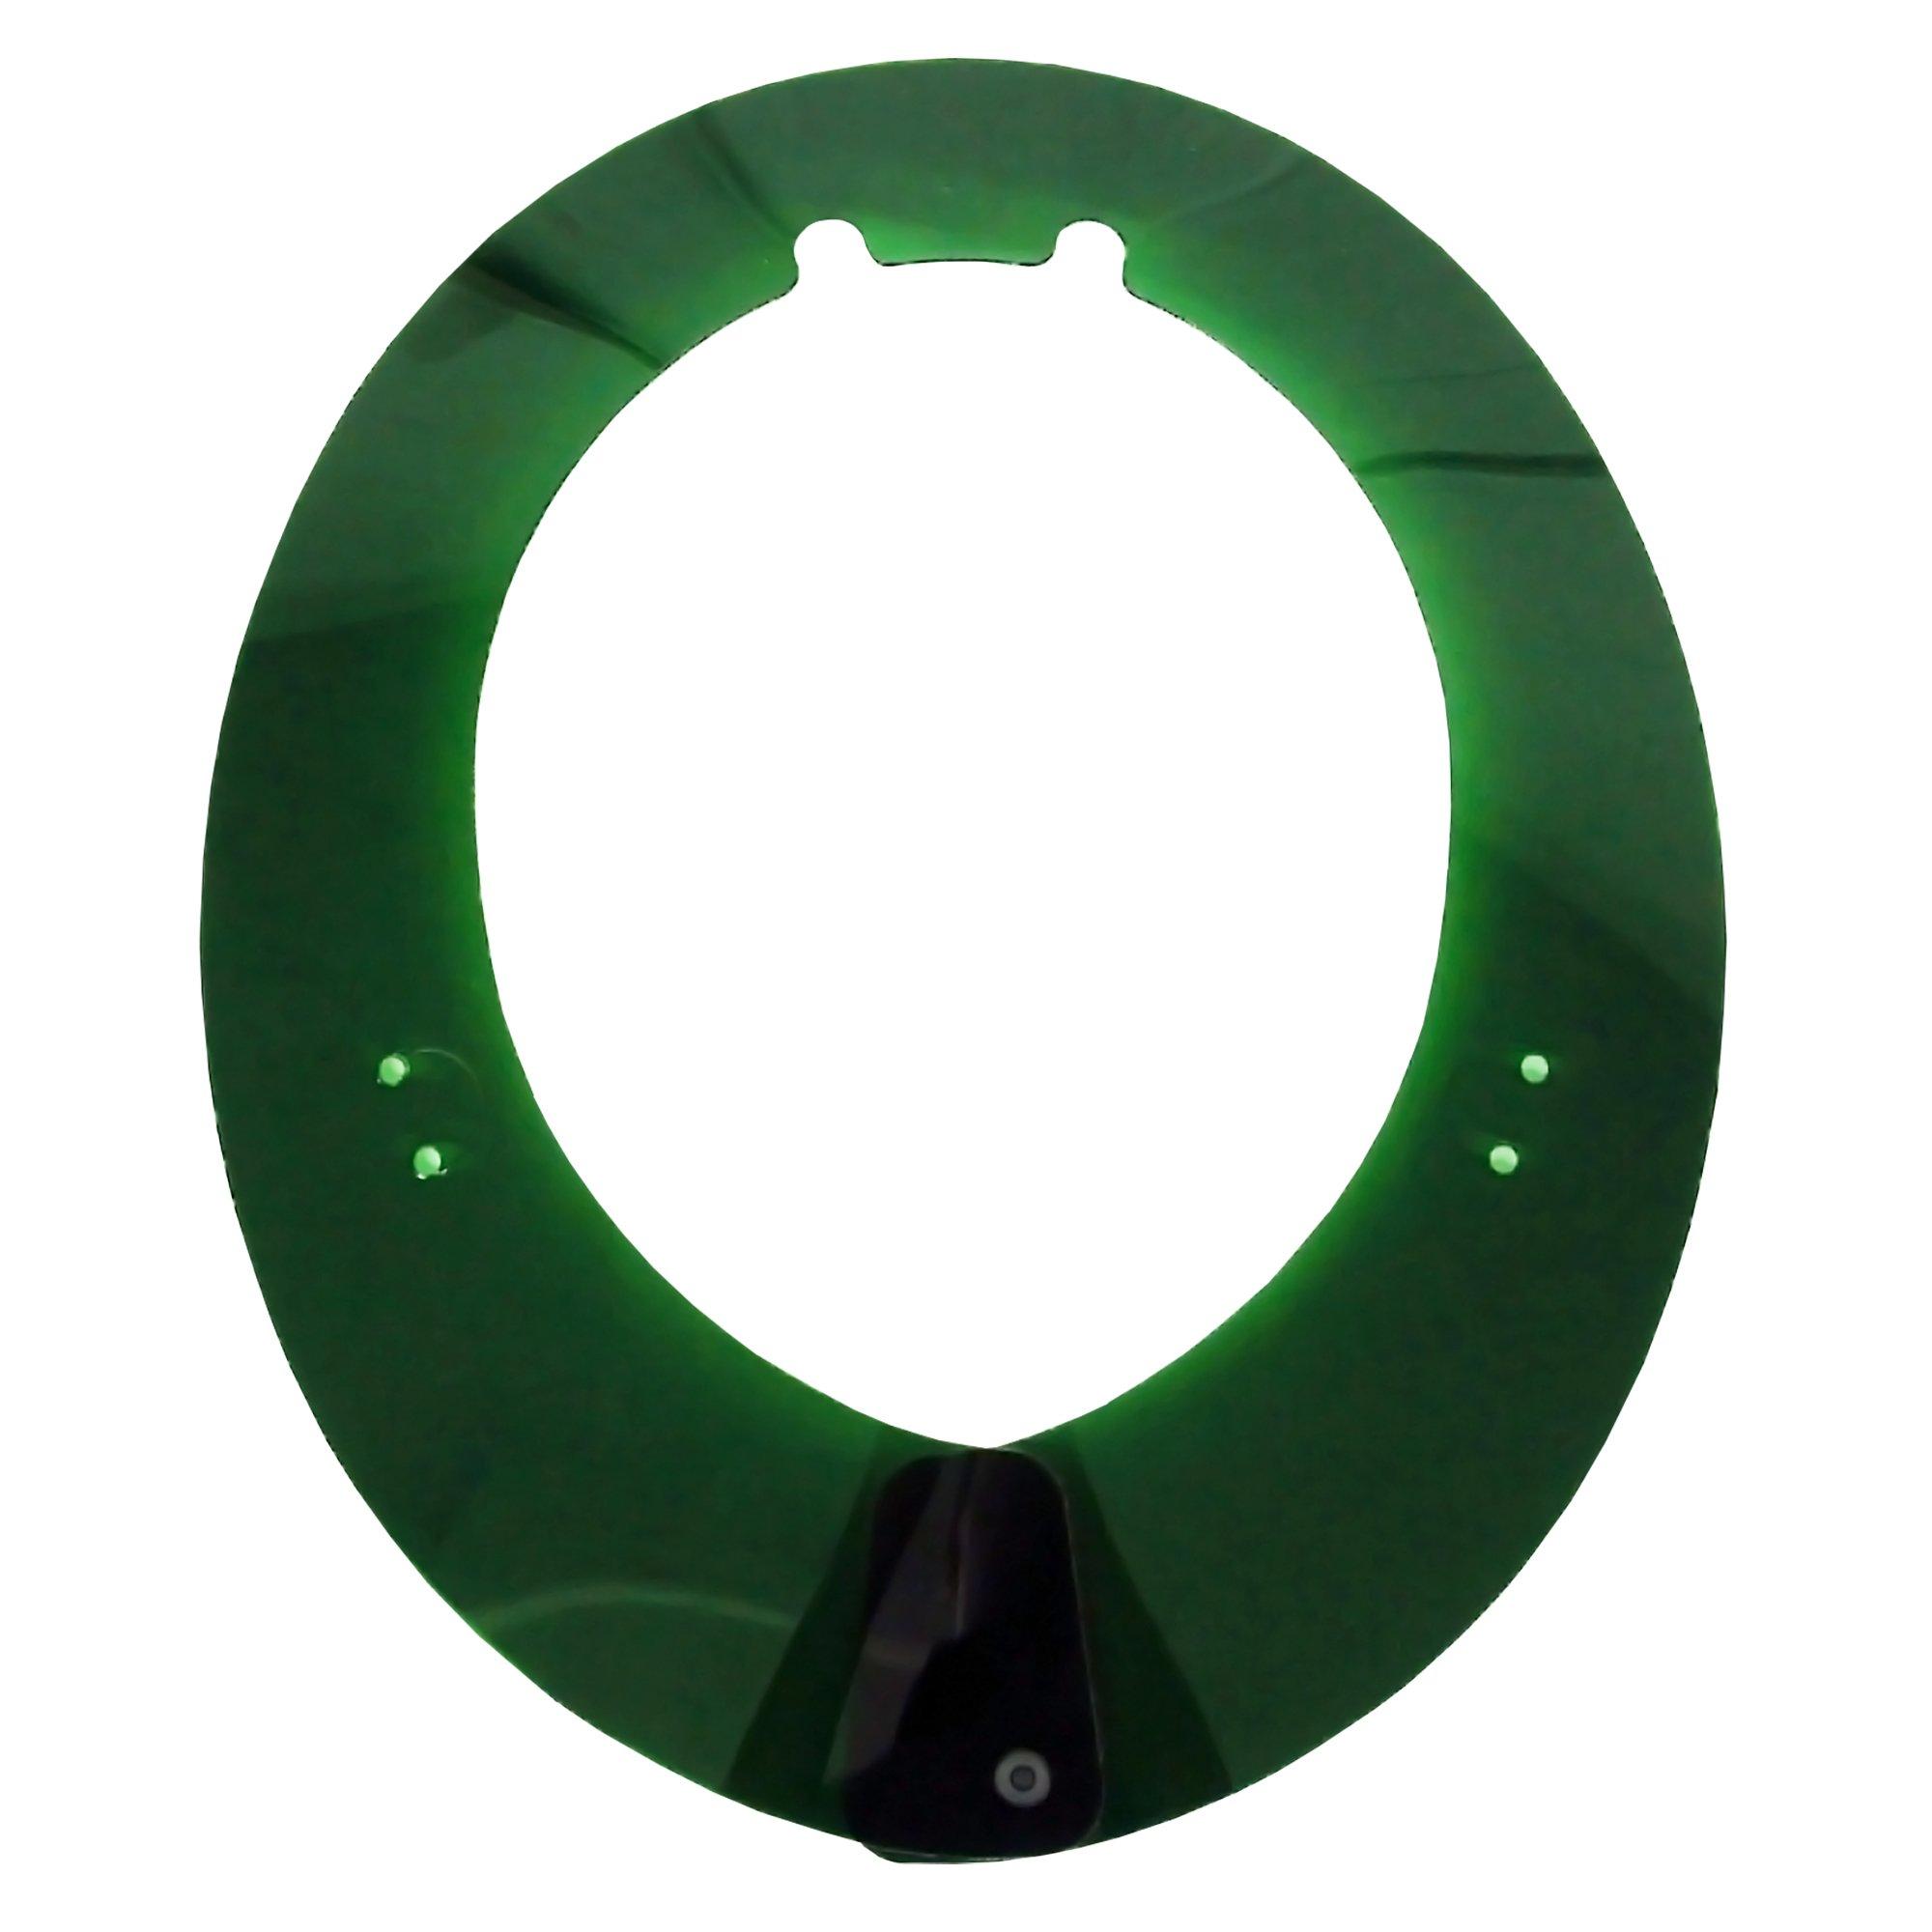 Jackson Safety A-S1 Full Brim Sun Shade (14461), Adapt Hard Hat for Shade, Green, 1 Sunshade / Order